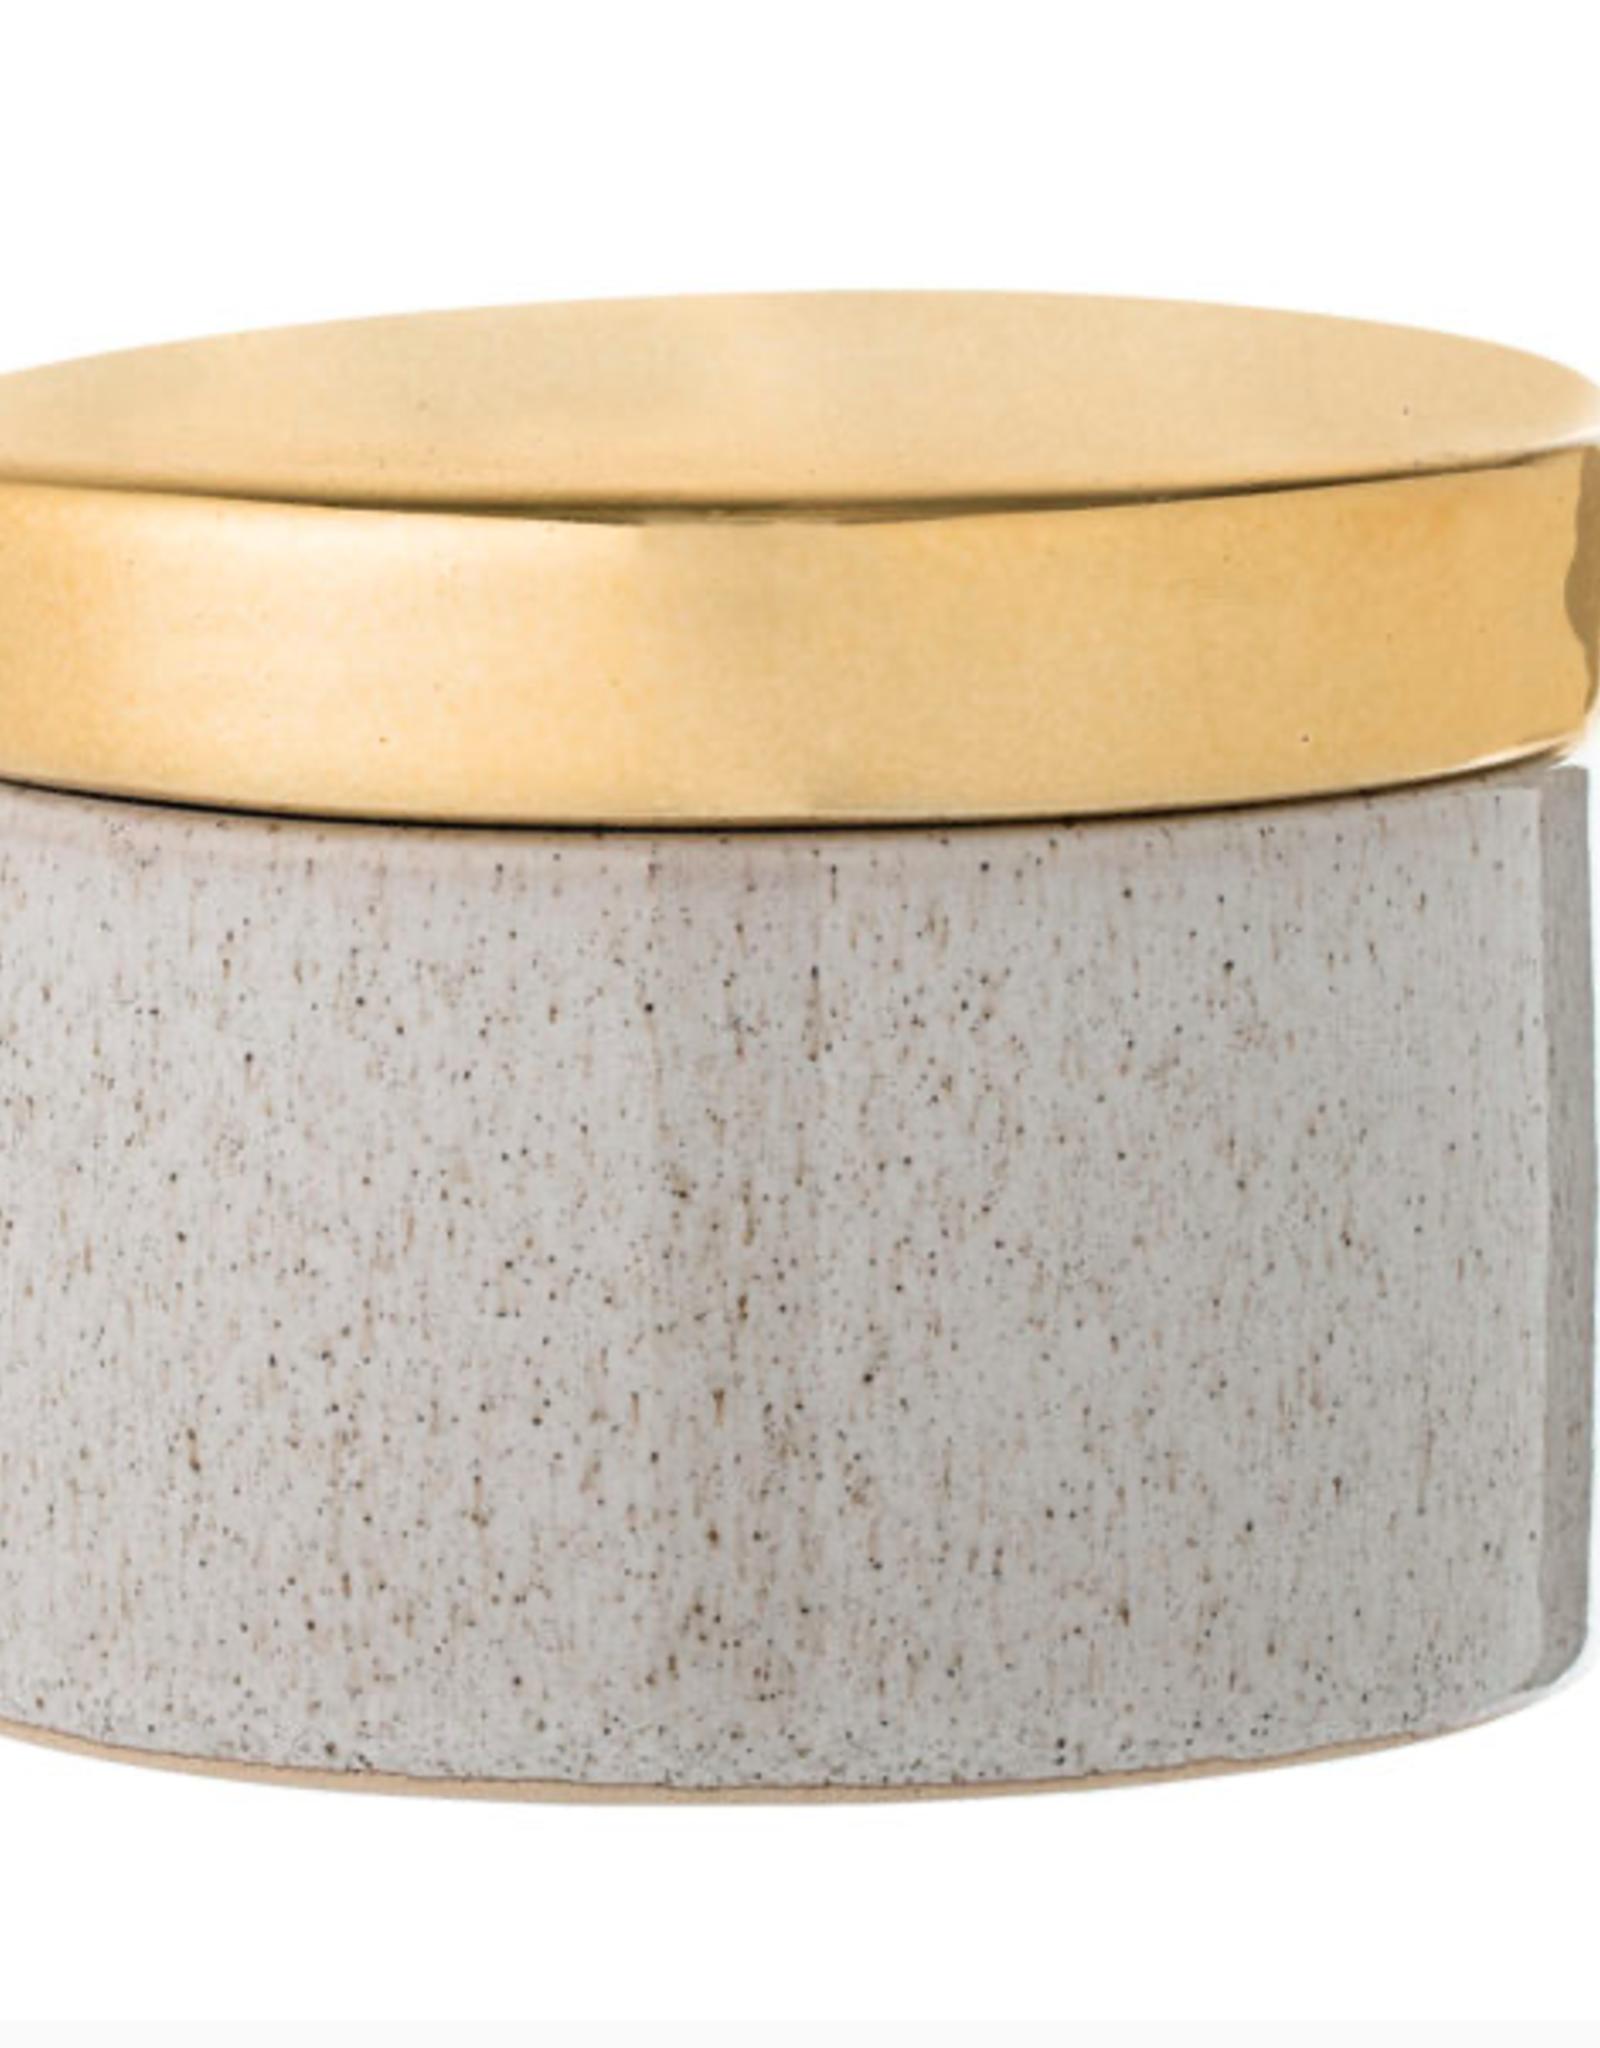 Bloomingville Bloomingville - jar stoneware natural and gold